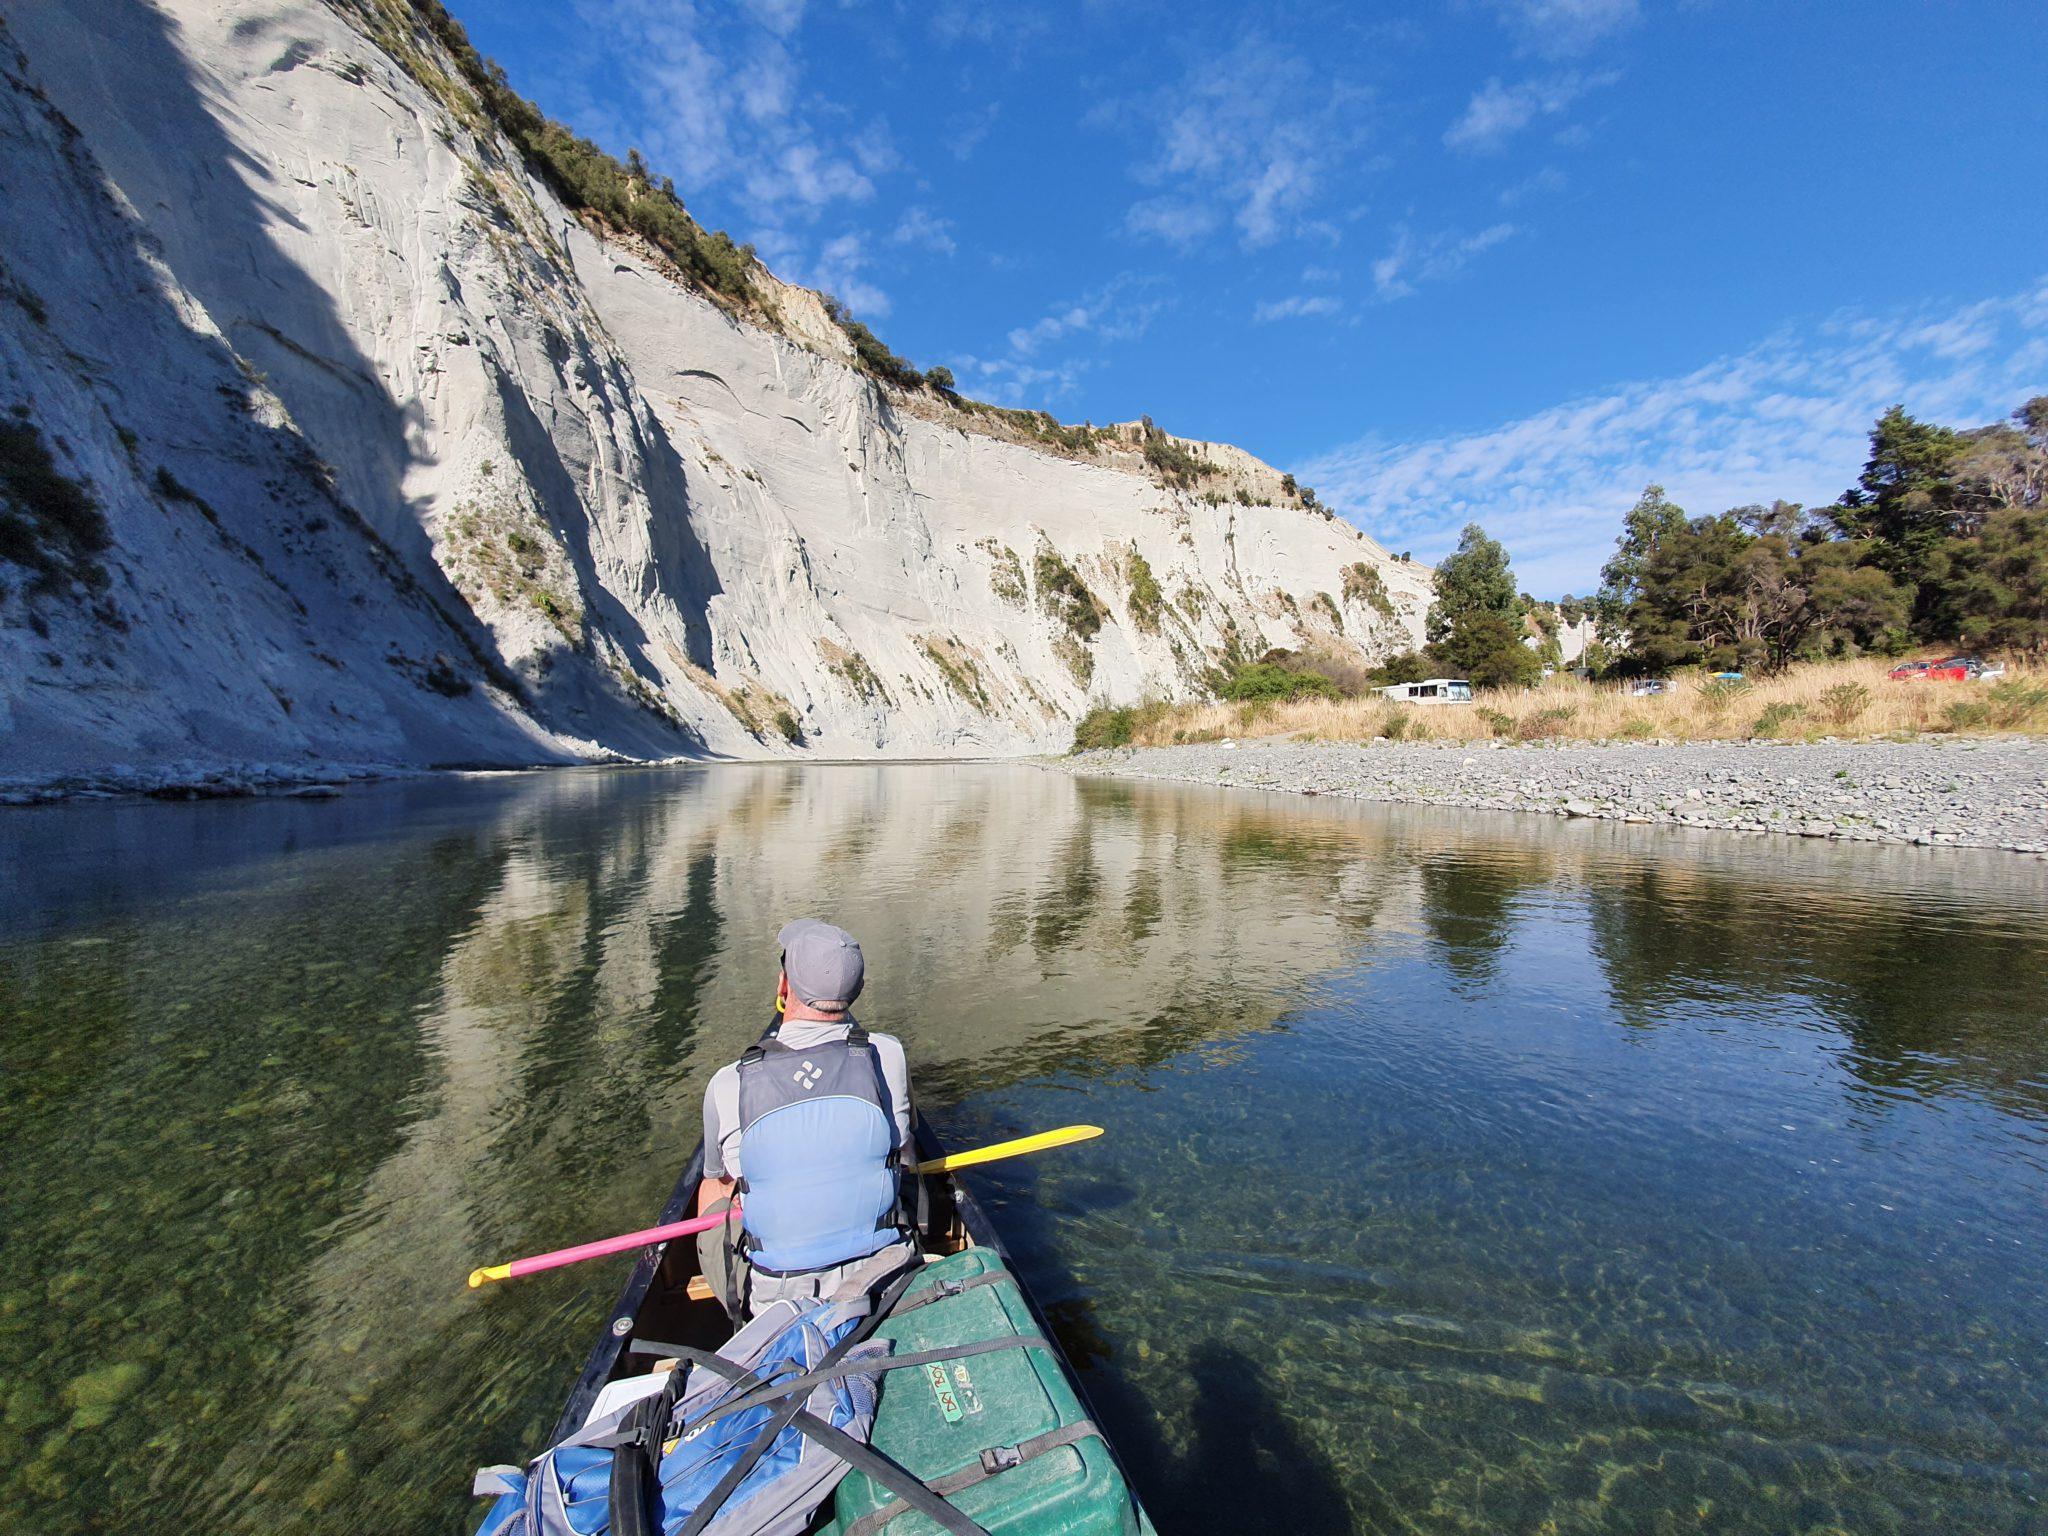 Canoe Safari Holiday in New Zealand: Rangitikei River tour